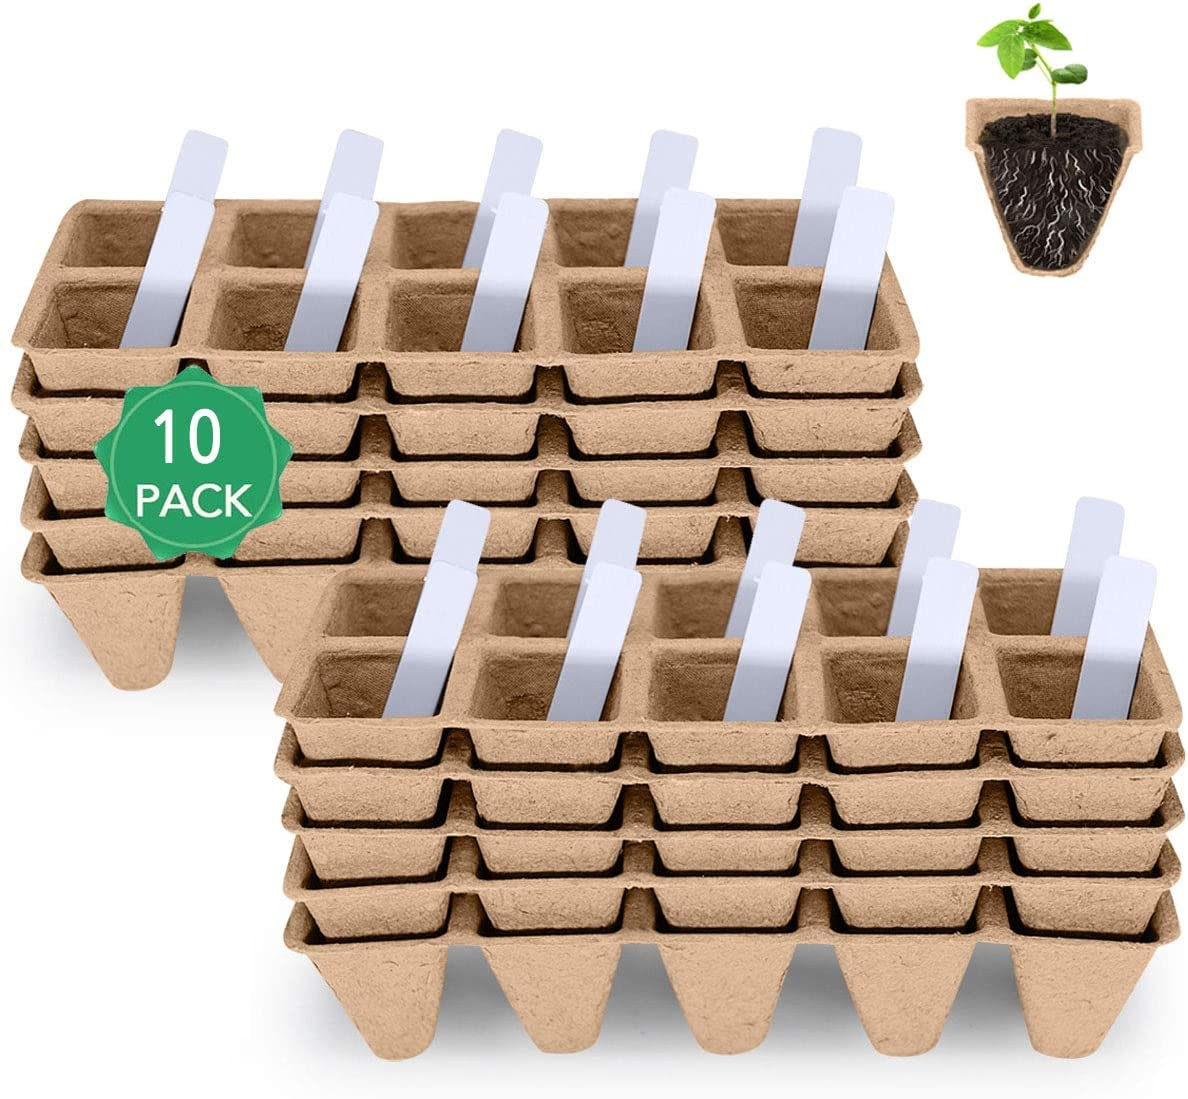 MacCoya Seed Starter Tray, Seedling Starter Peat Pots Kits, Biodegradable Compostable Planting Pots for Vegetable Fruit Flower, Indoor Outdoor & Organic Garden, 100 Cells Plus 20 Plant Labels